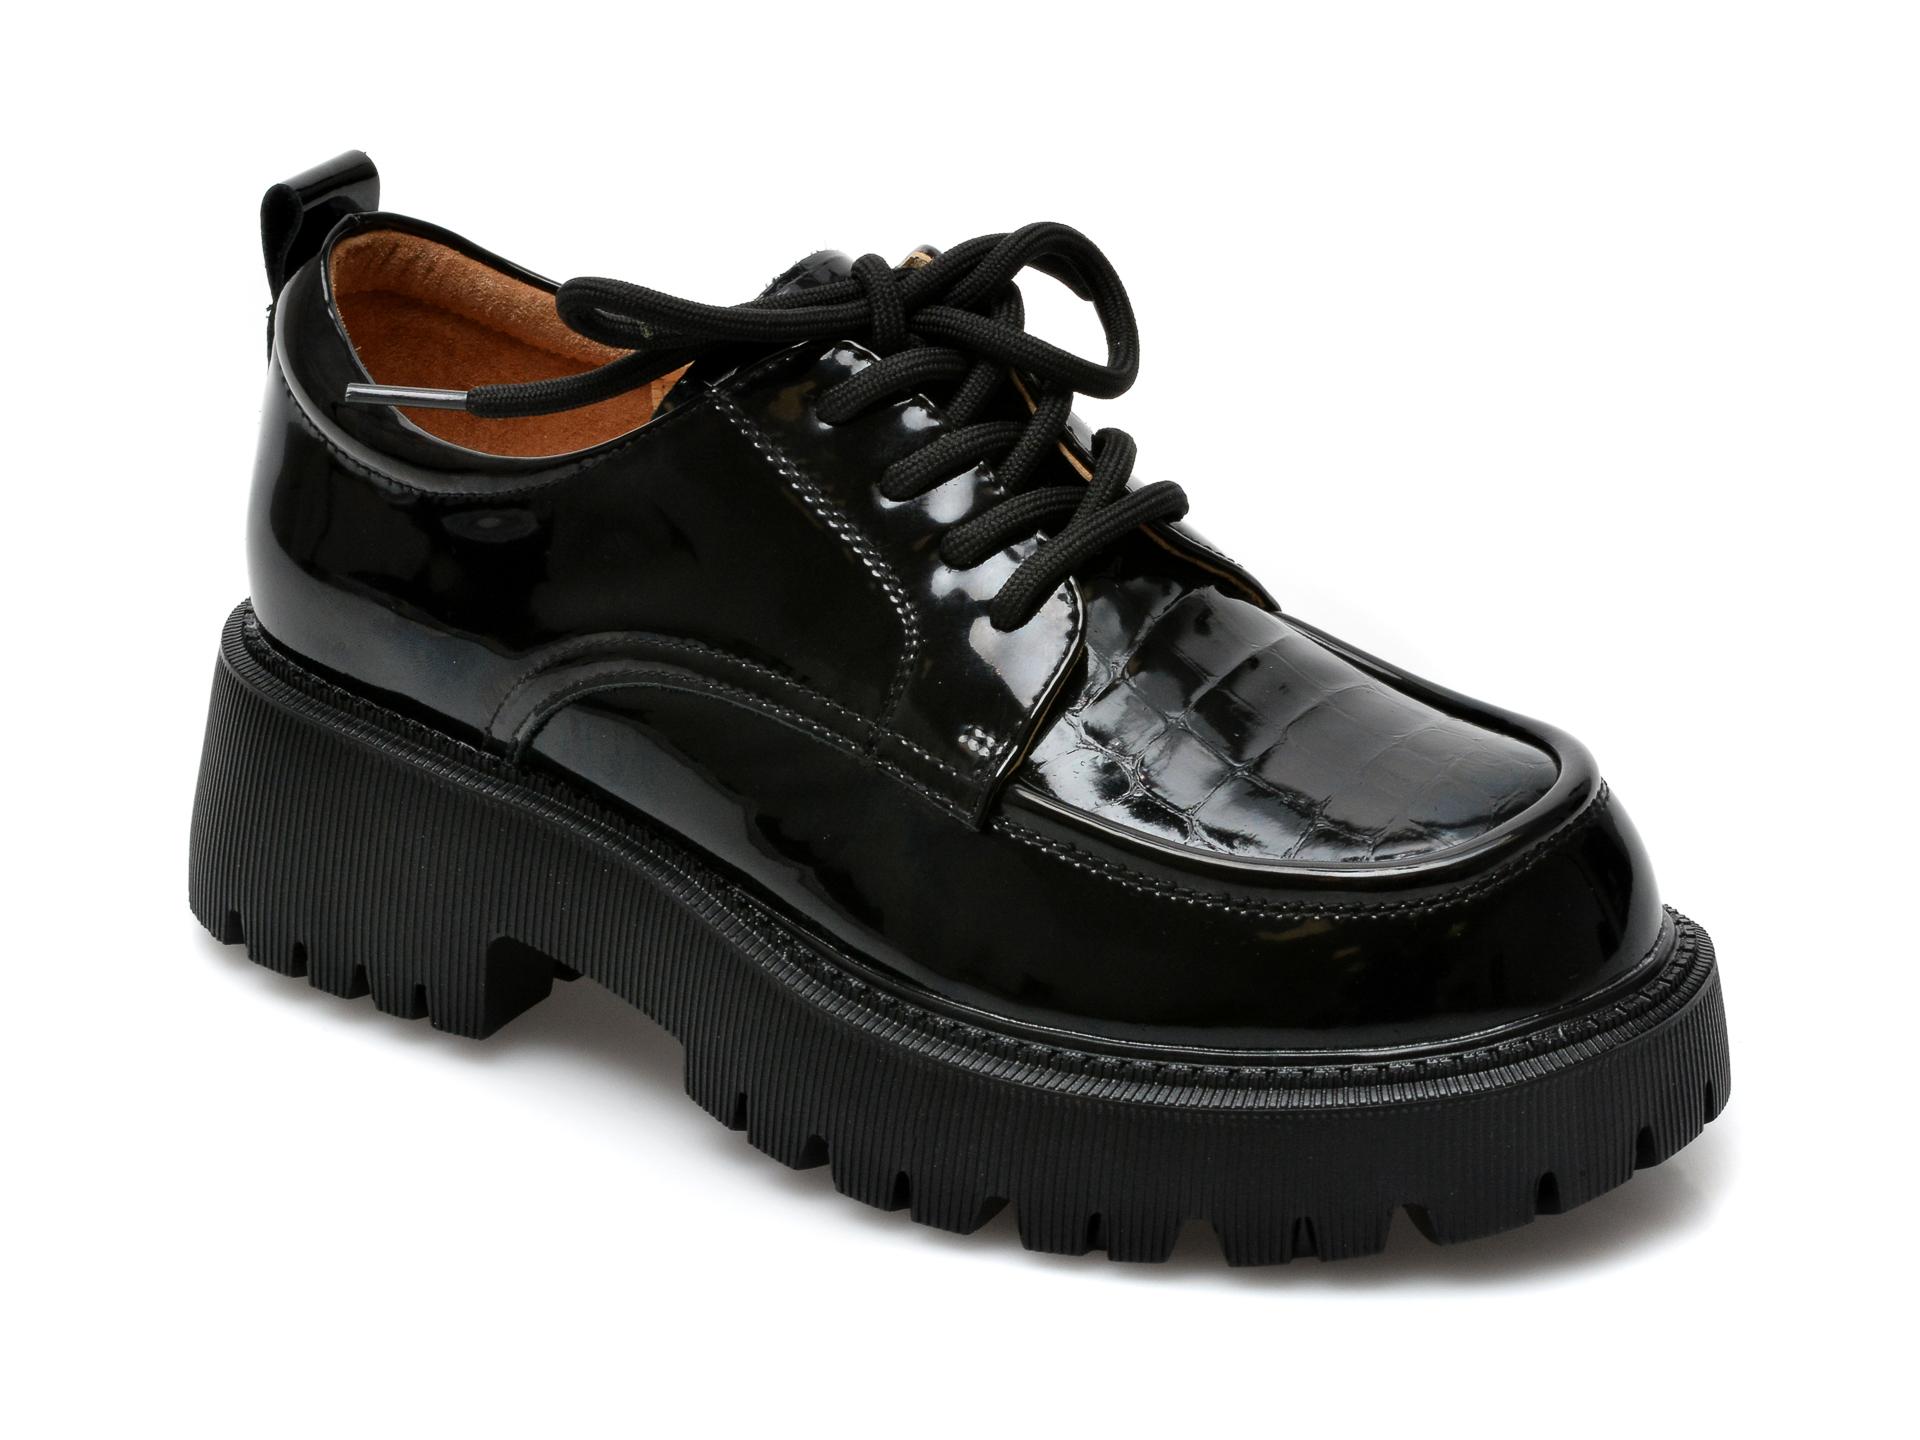 Pantofi GRYXX negri, A21170, din piele naturala lacuita imagine otter.ro 2021